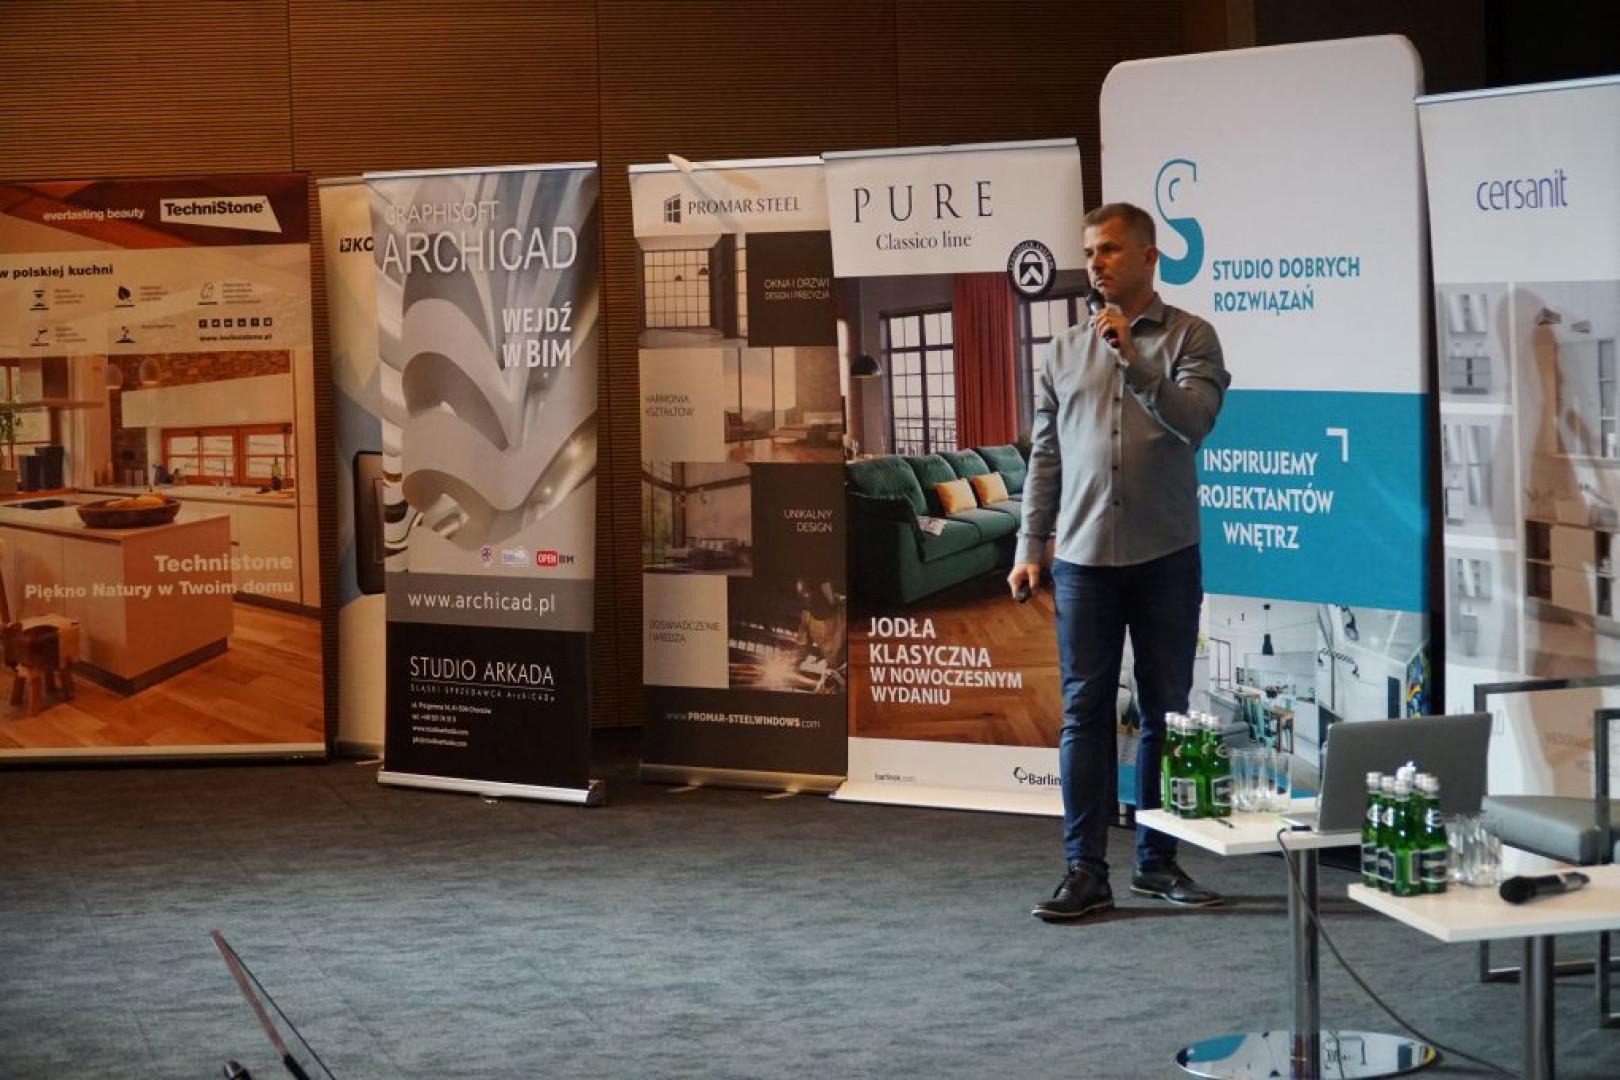 Piotr Buśko, WSC Graphisoft